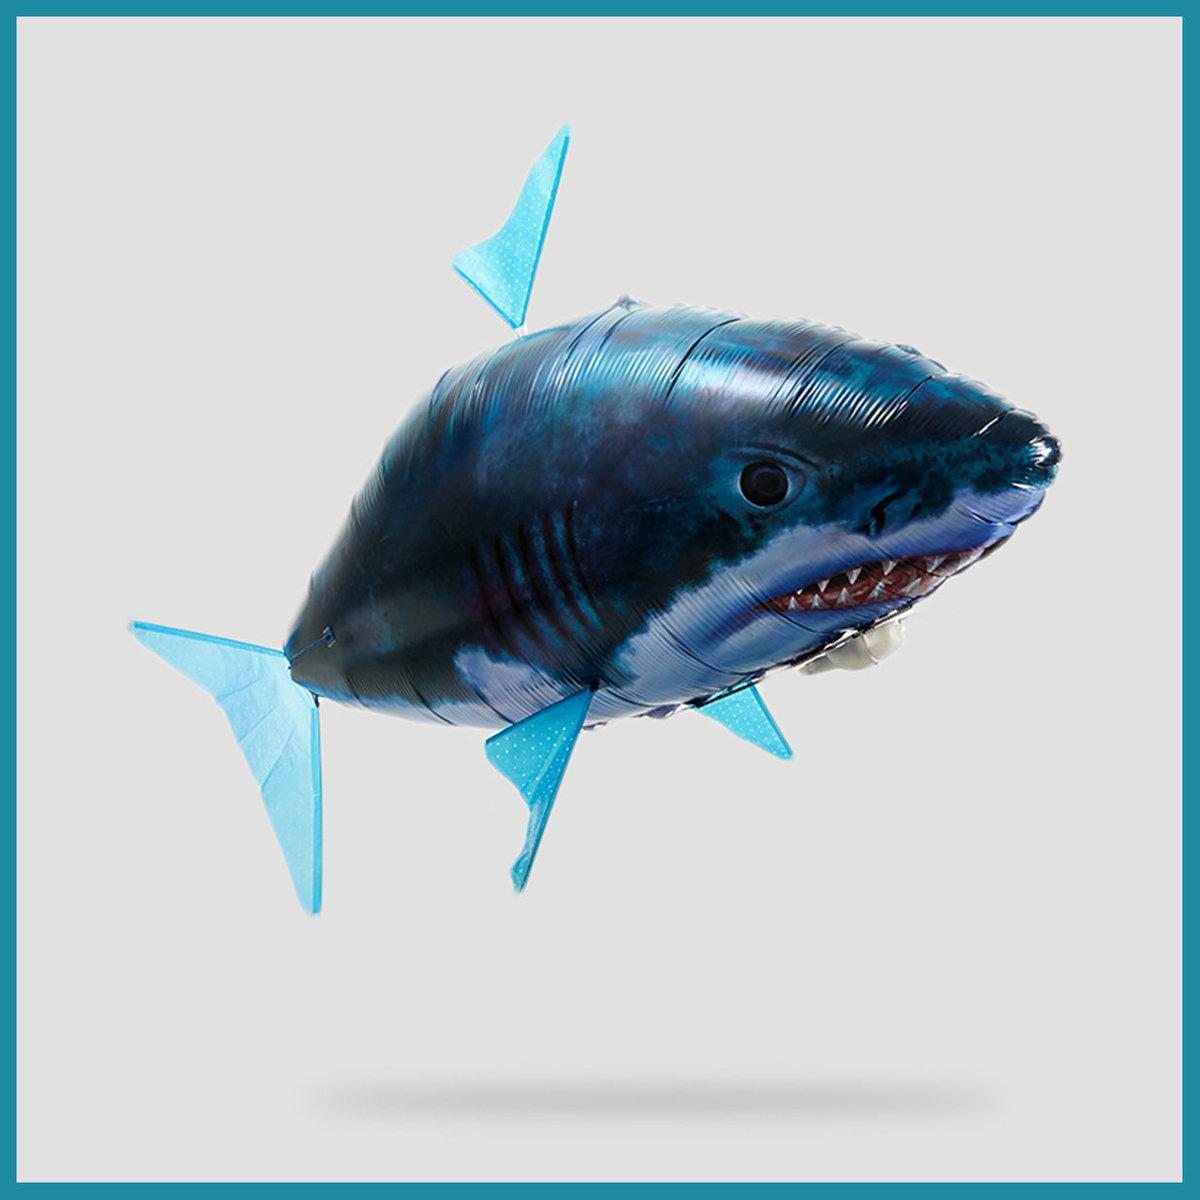 Remote Control Air Swimming Fish